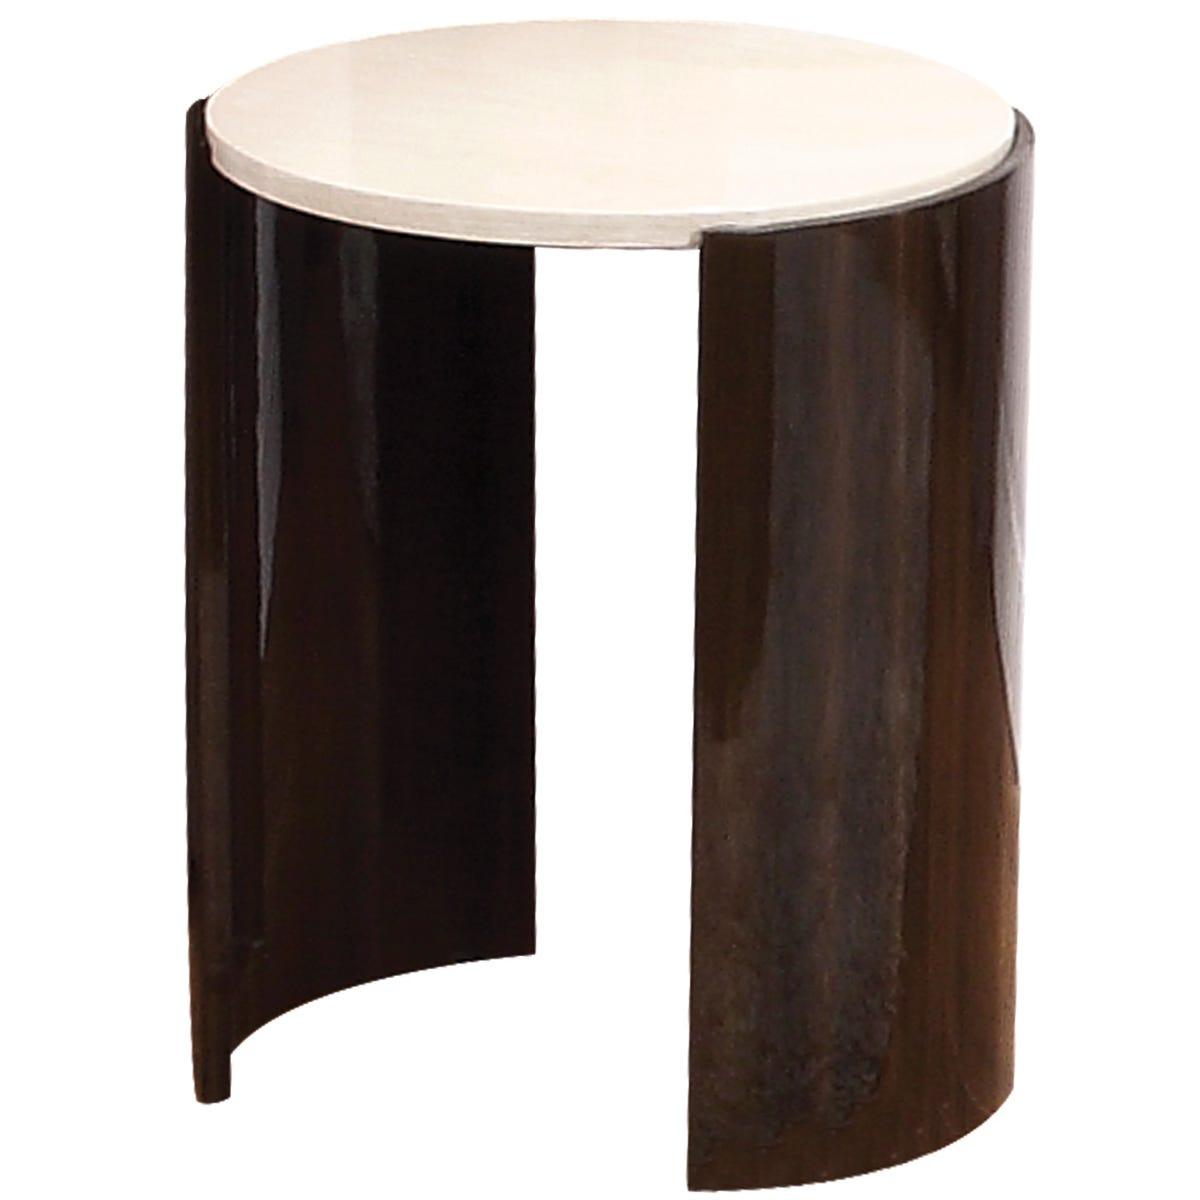 Jual Milan Walnut High Gloss Lamp Table - Large